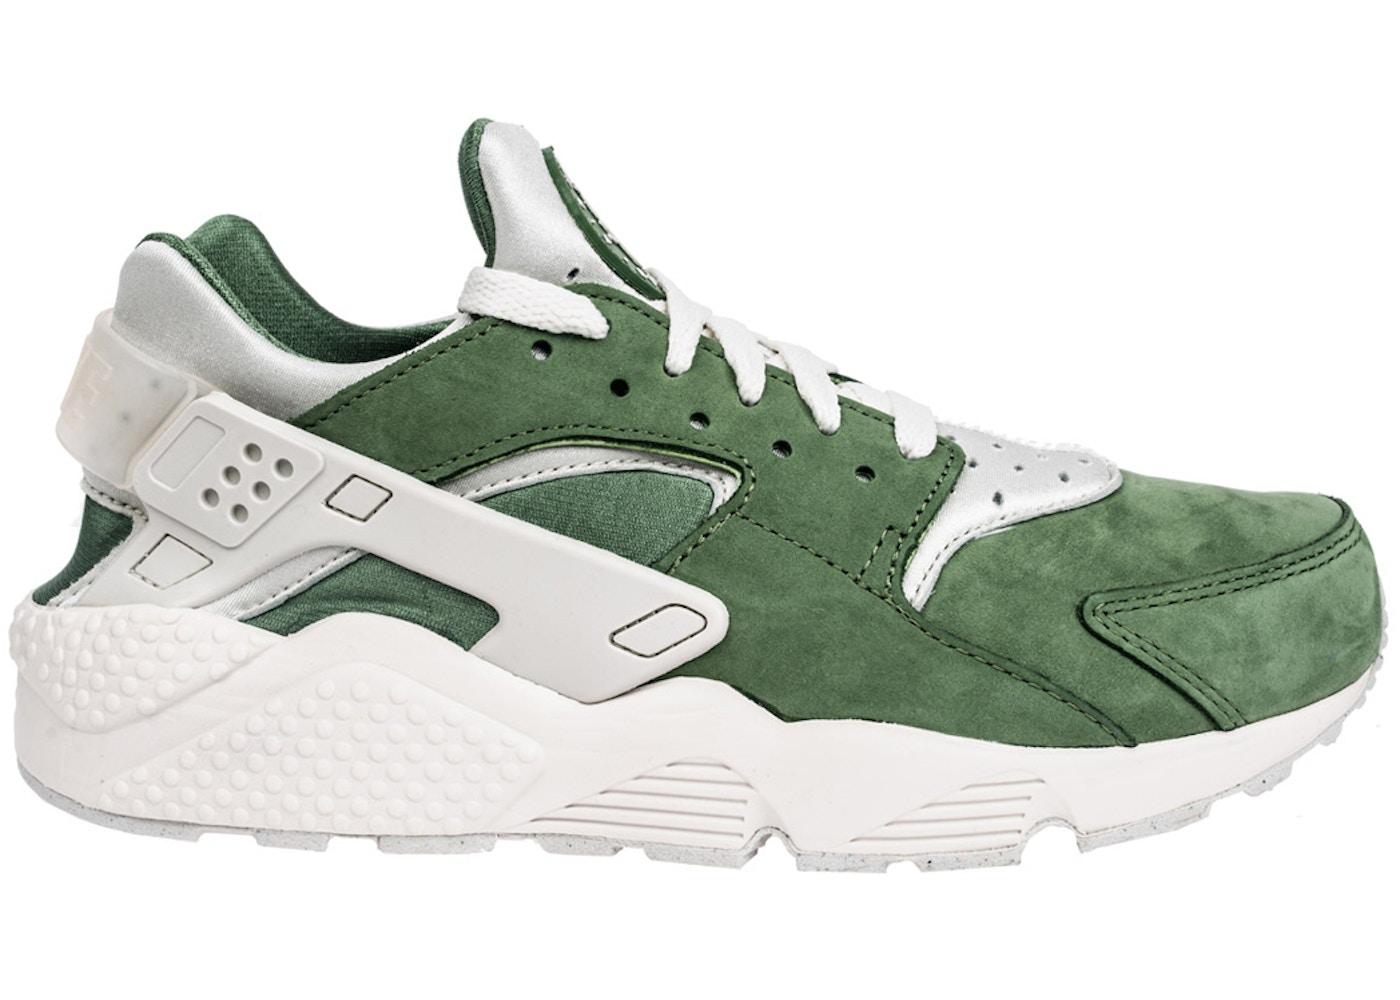 sports shoes 4e5fe 0b254 Air Huarache Treeline - 704830-300